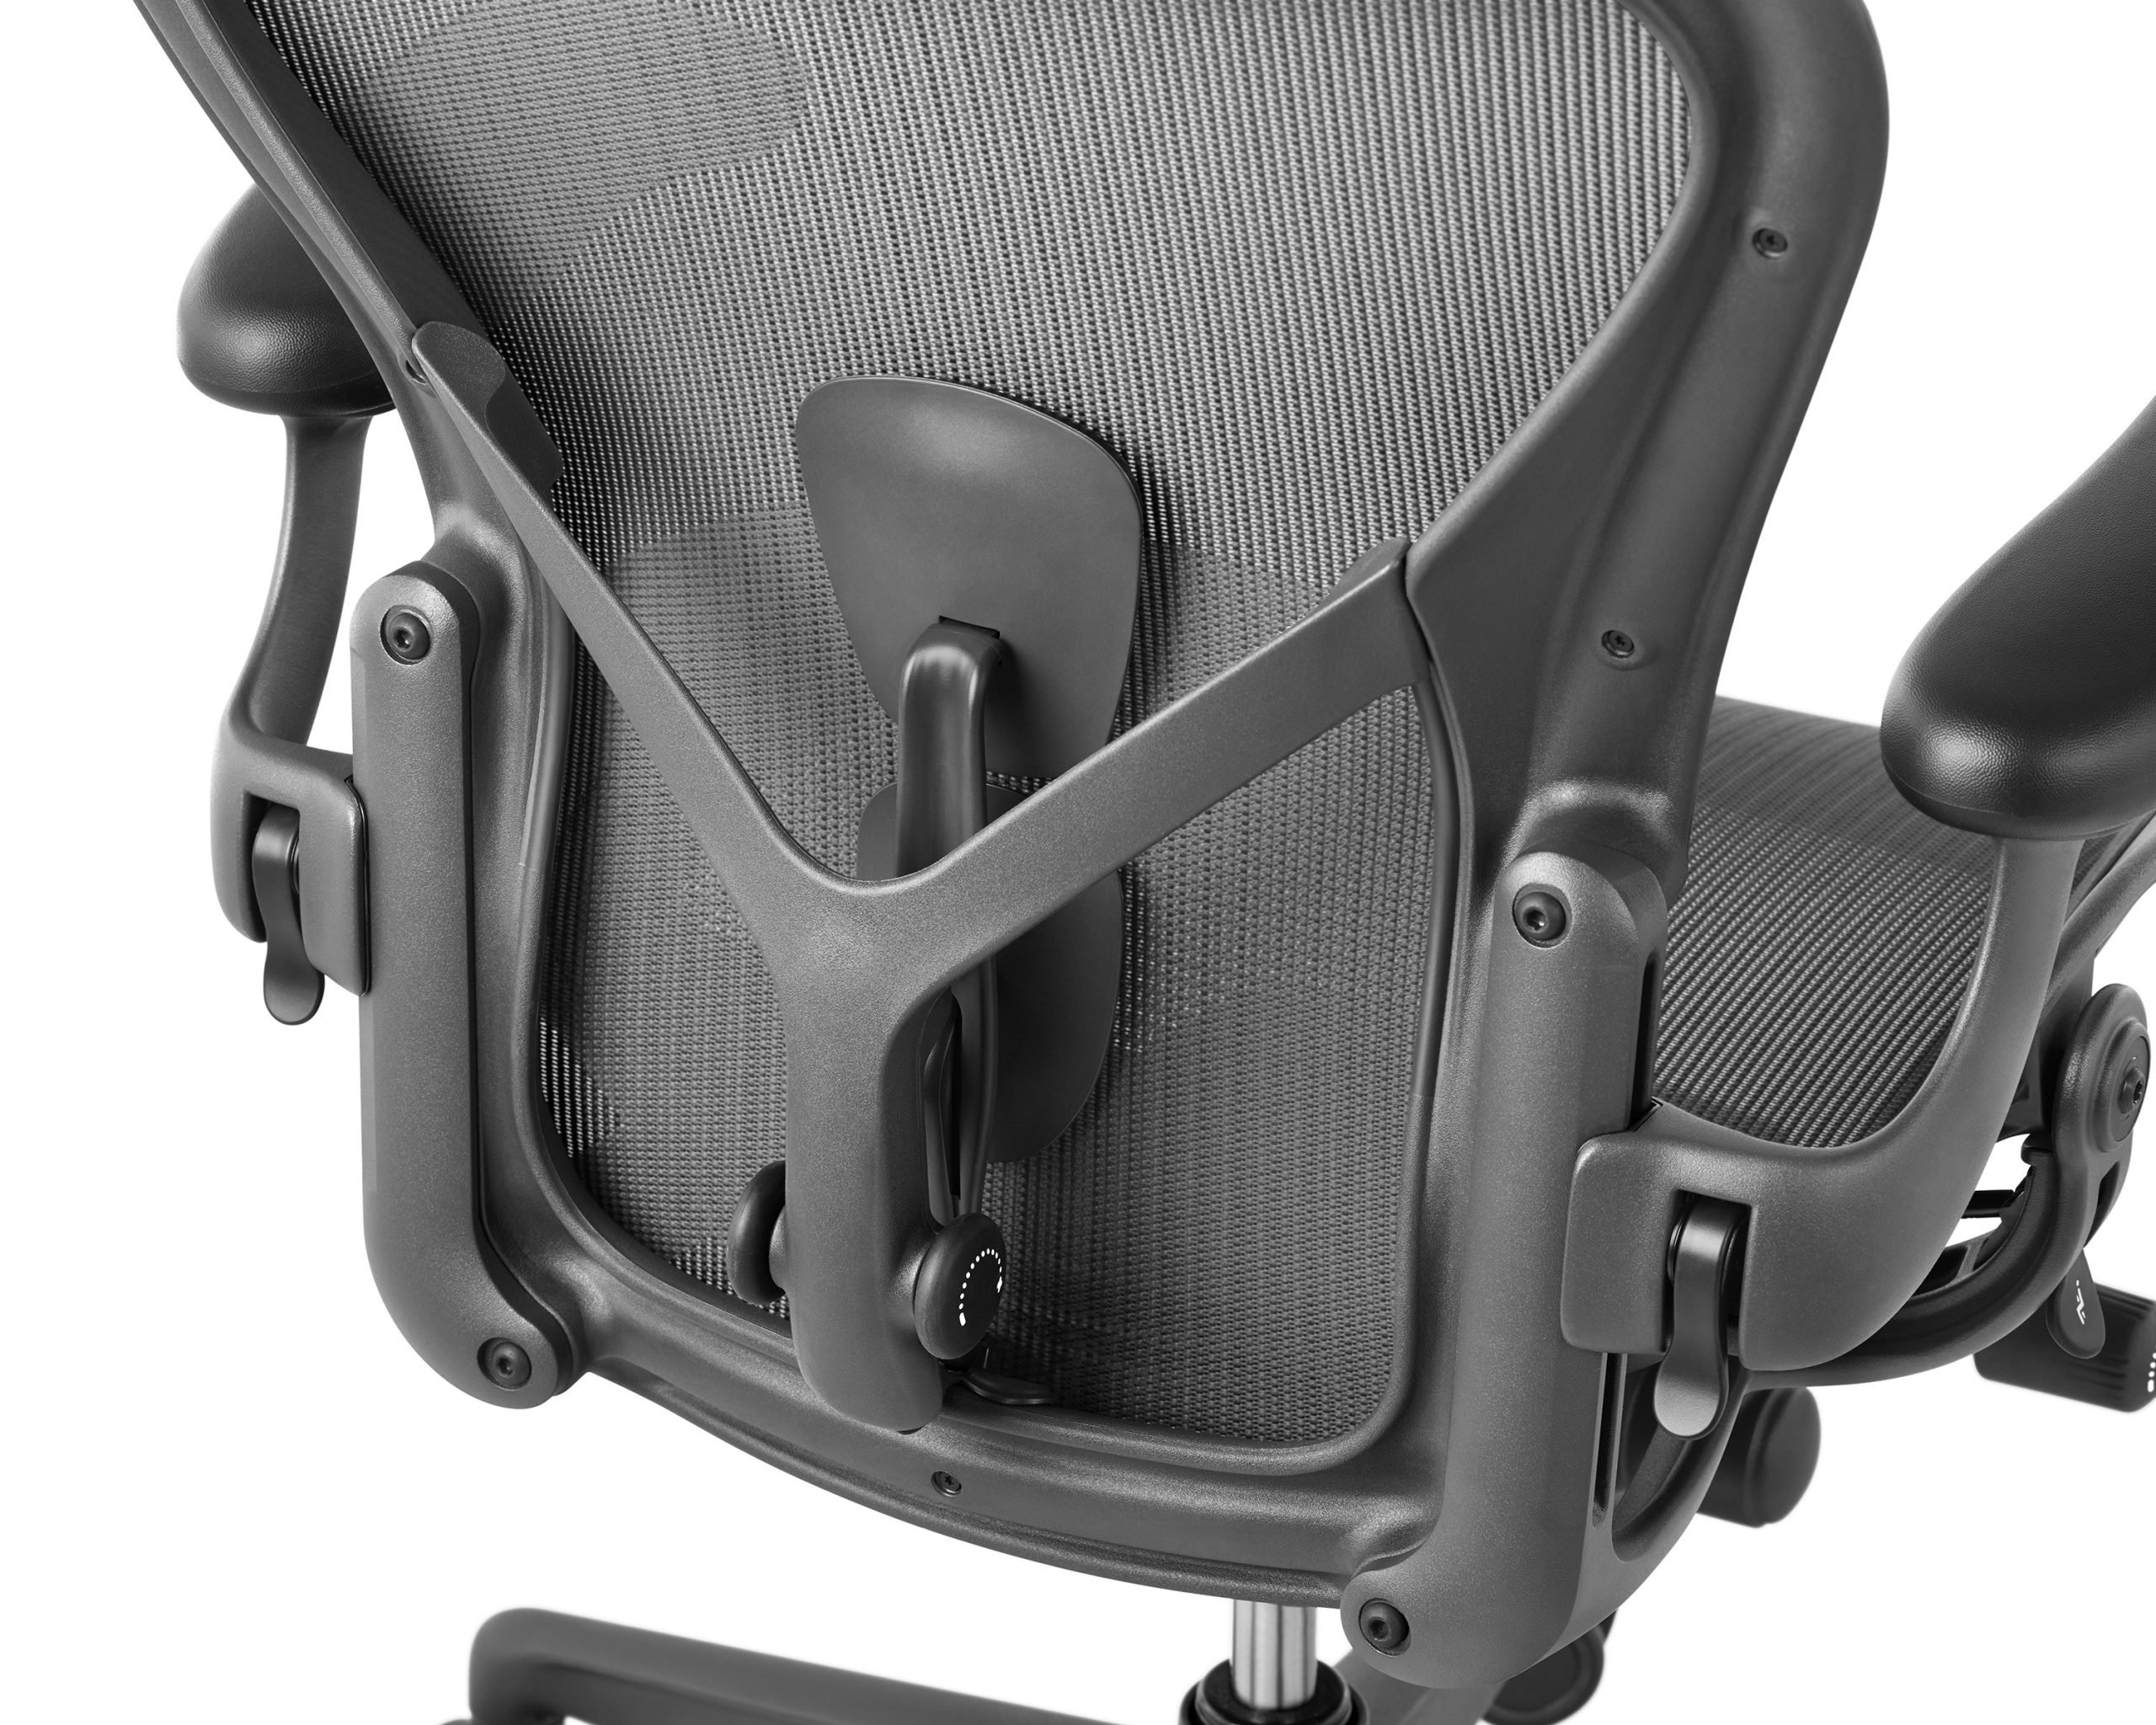 Sistema PostureFit SL na cadeira Aeron